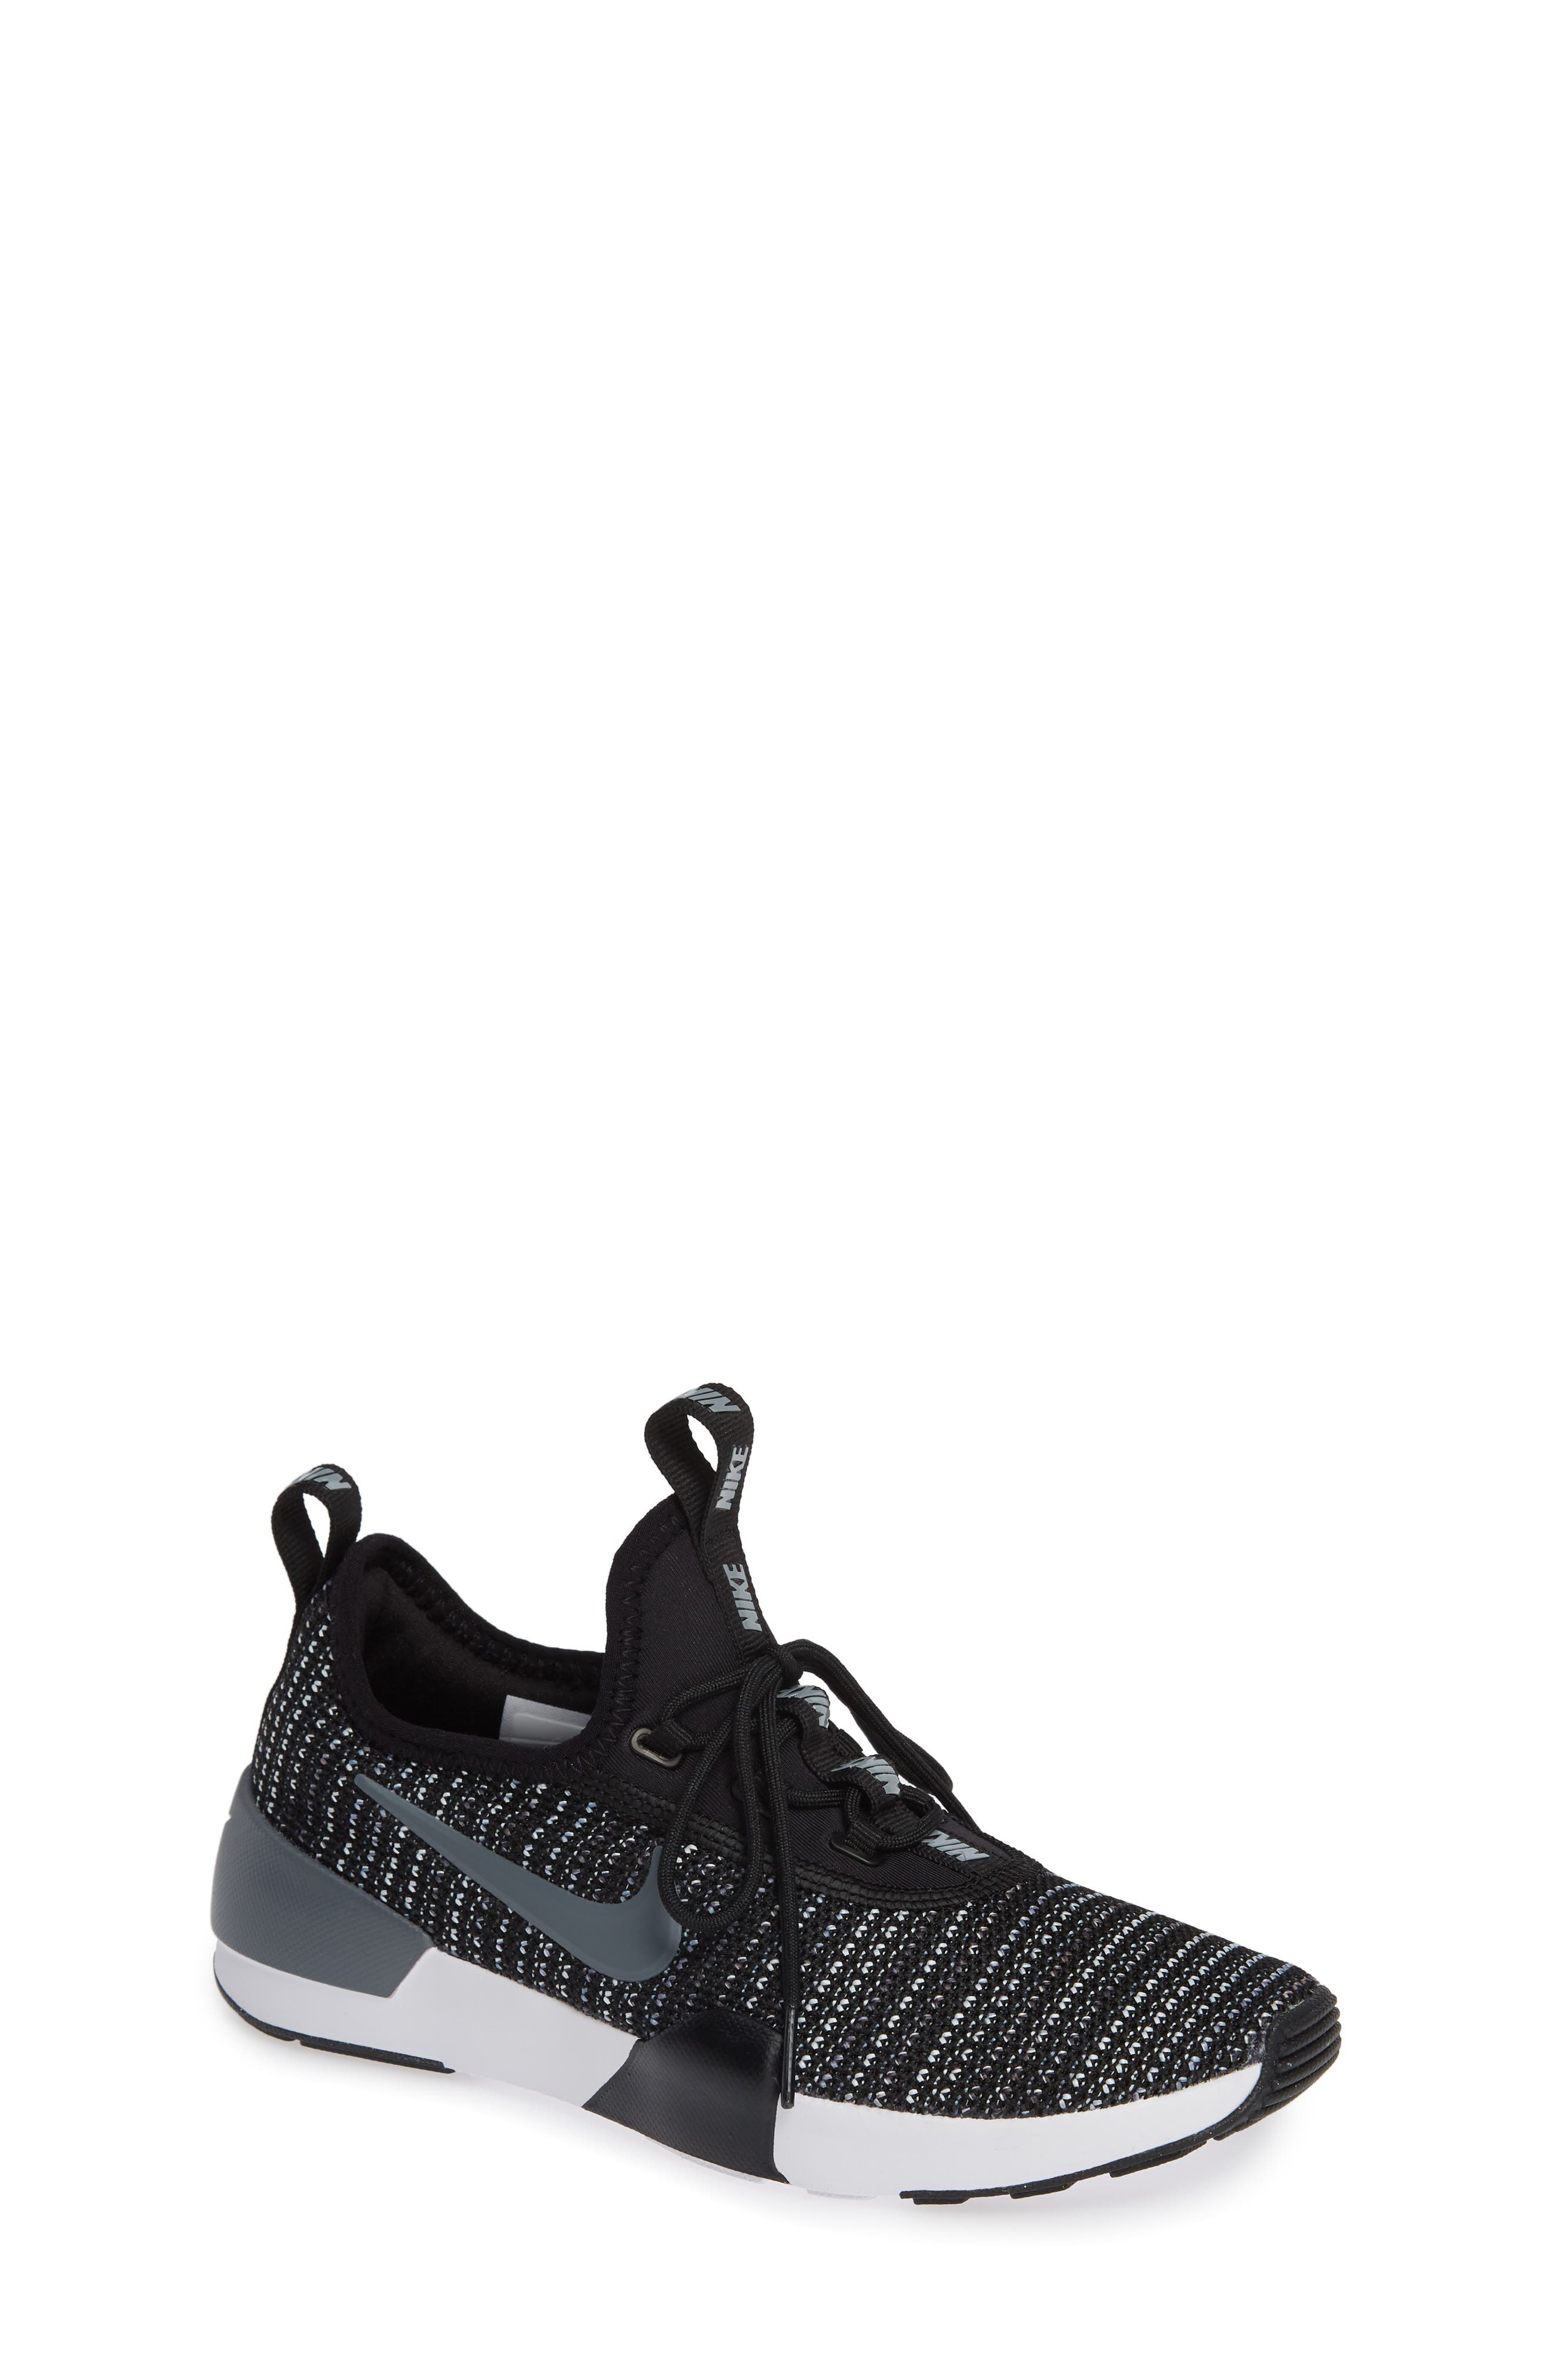 Ashin Modern Sock Knit Sneaker,                             Main thumbnail 1, color,                             Black/ Cool Grey/ Anthracite